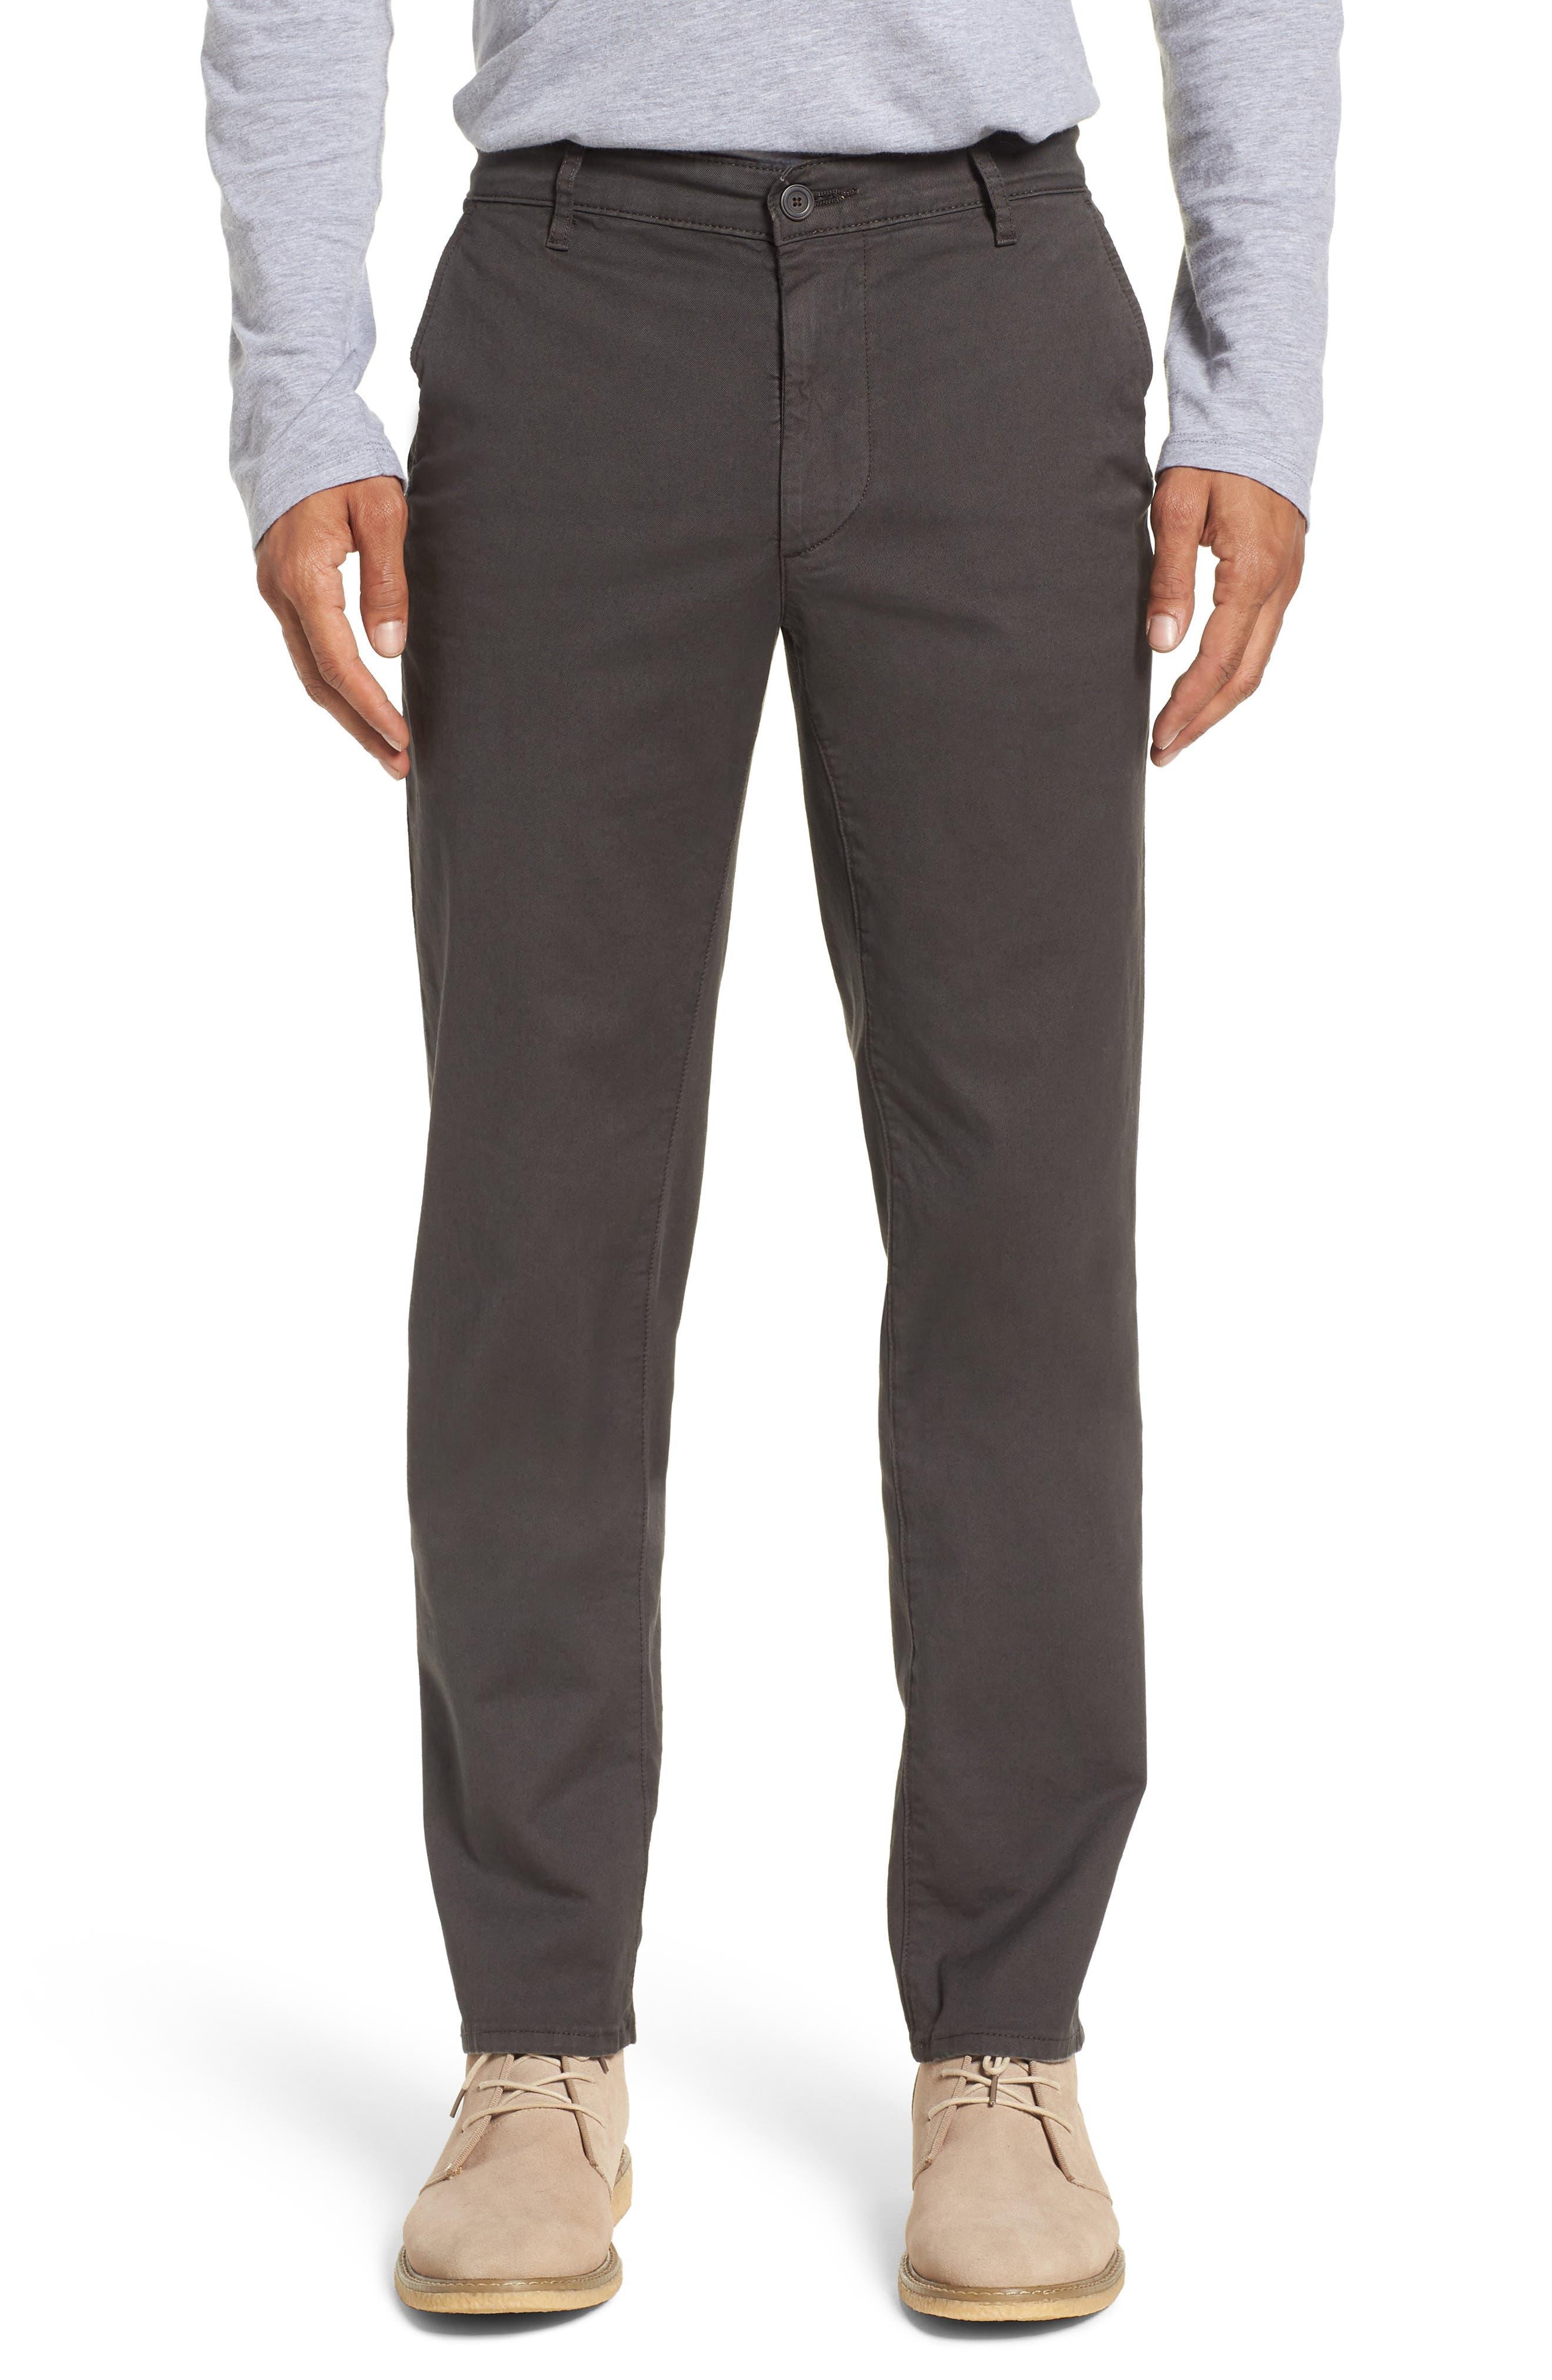 Main Image - AG Marshall Slim Straight Leg Chino Pants